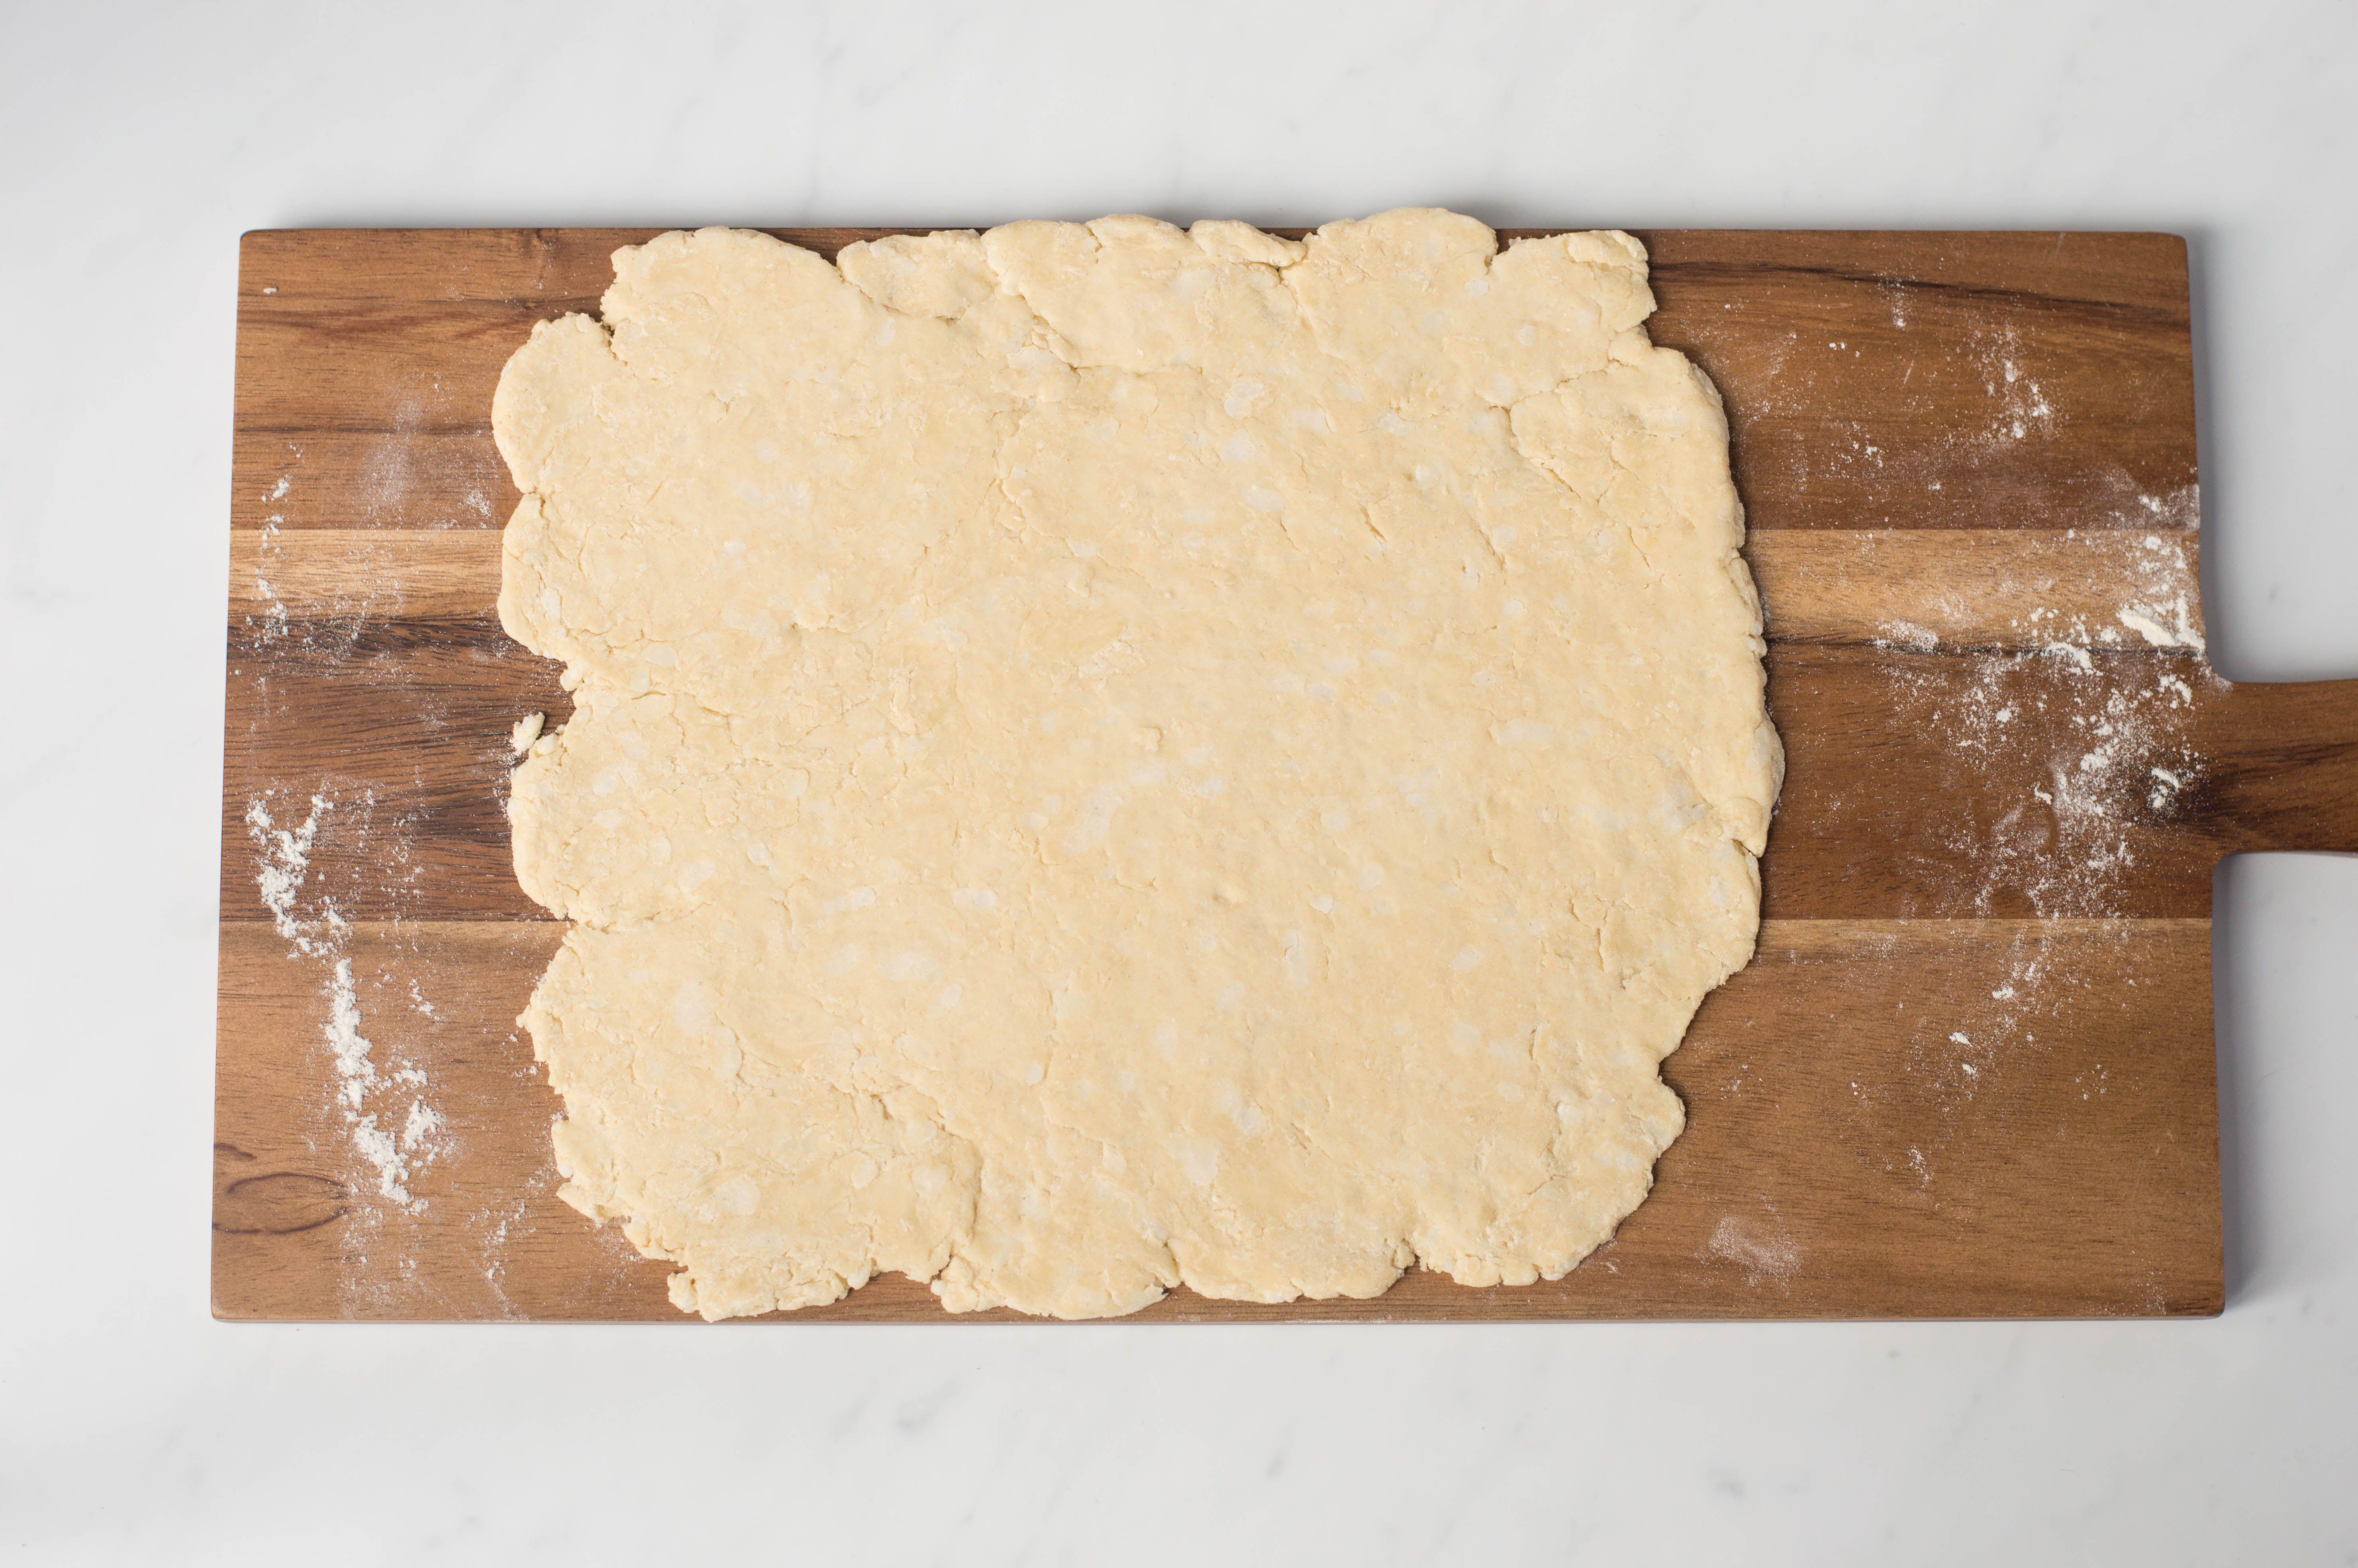 Dough on lightly floured wooden board